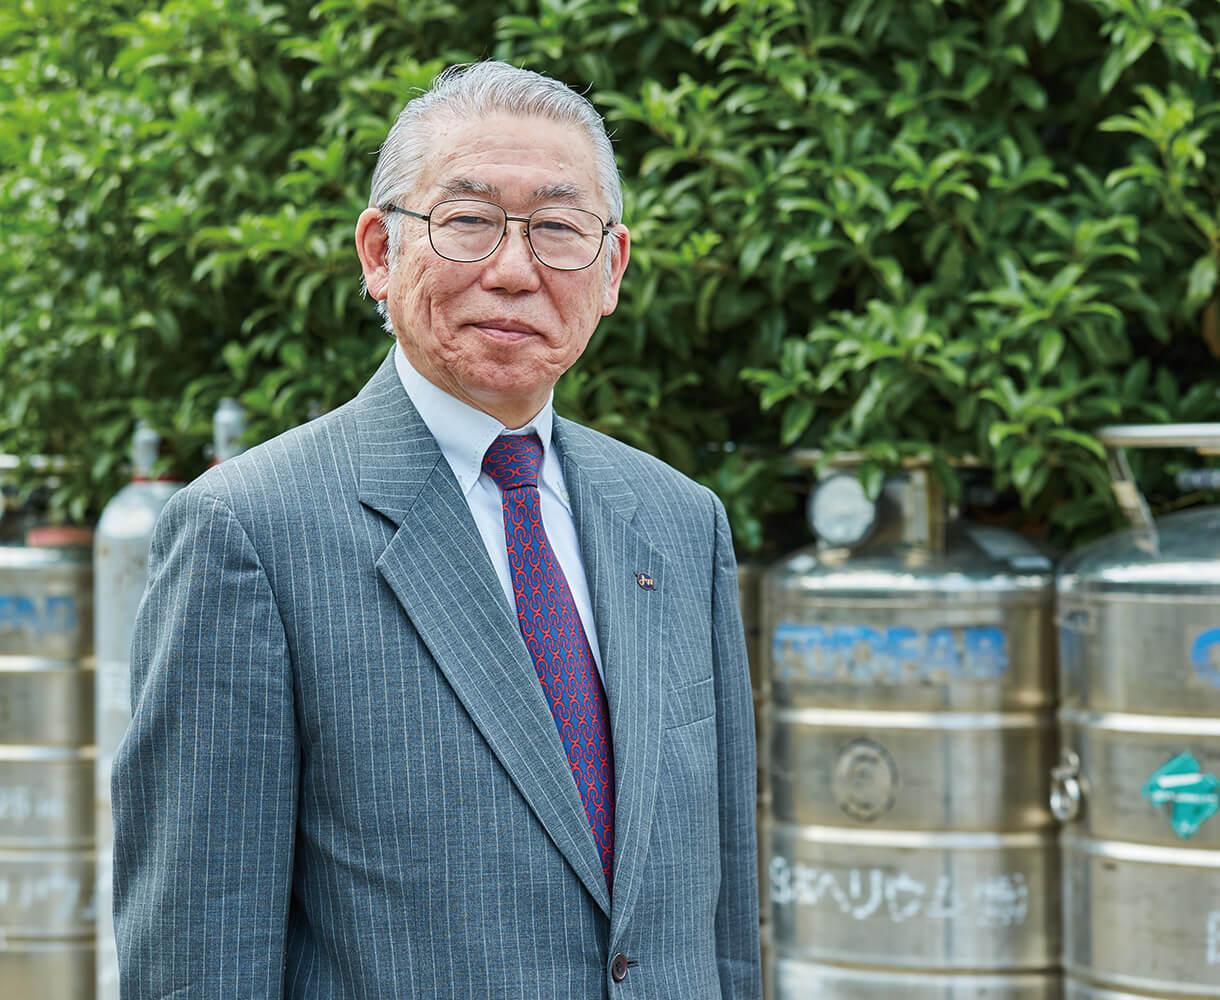 President and CEO Ken Hagiwara